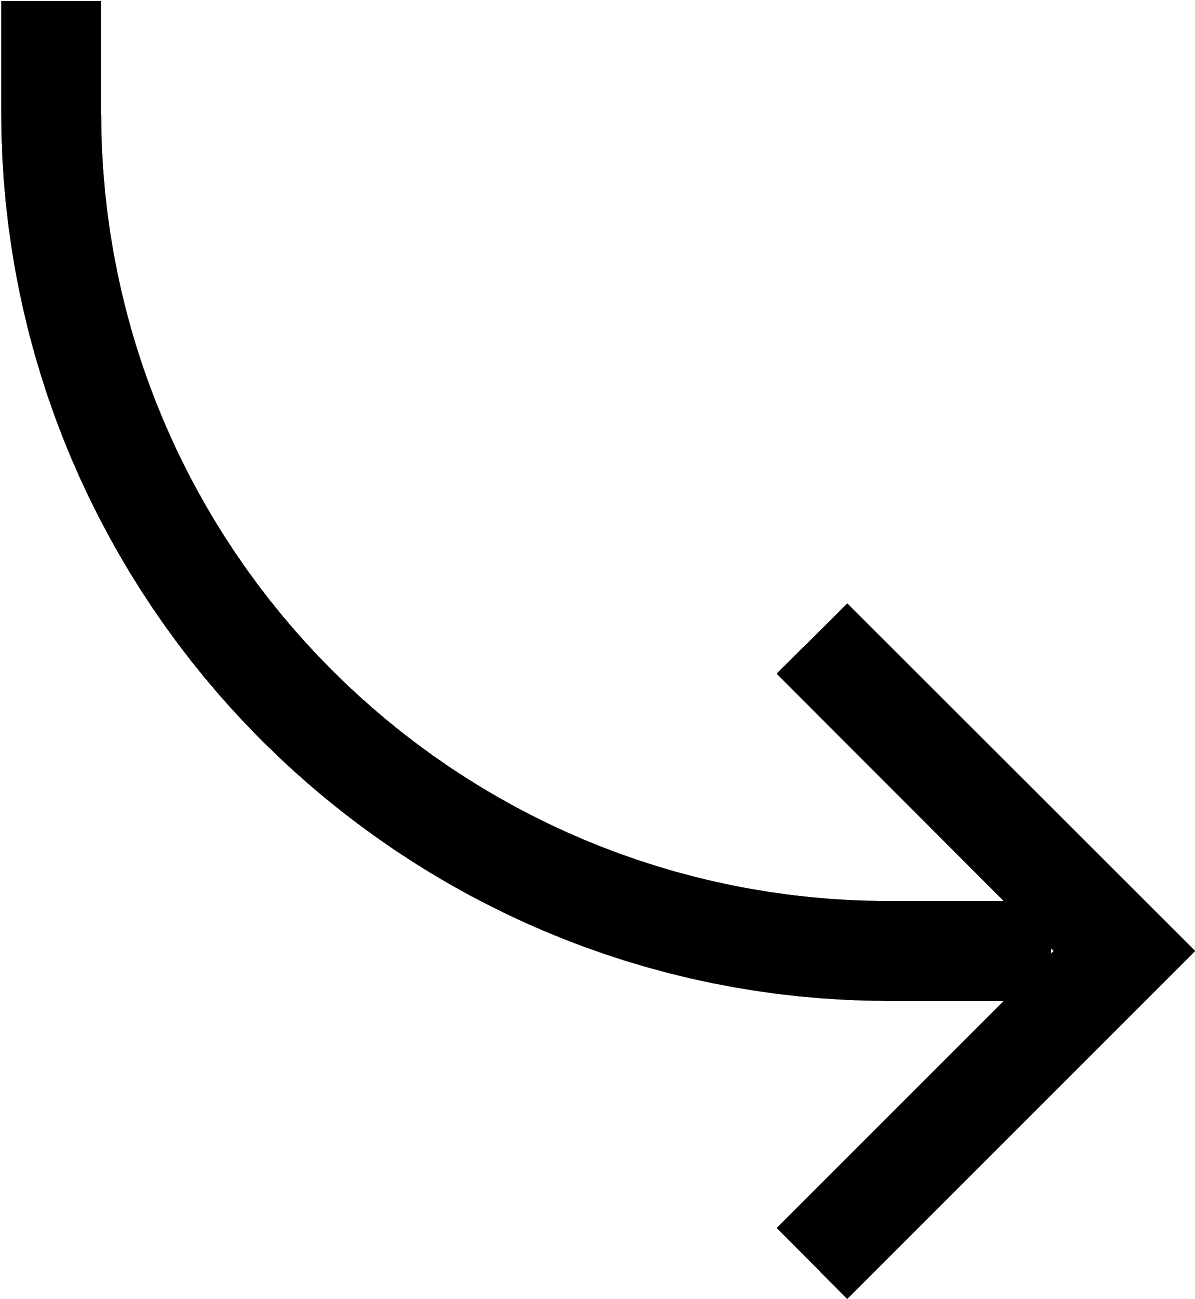 Clip Art Curved Arrow Icon.